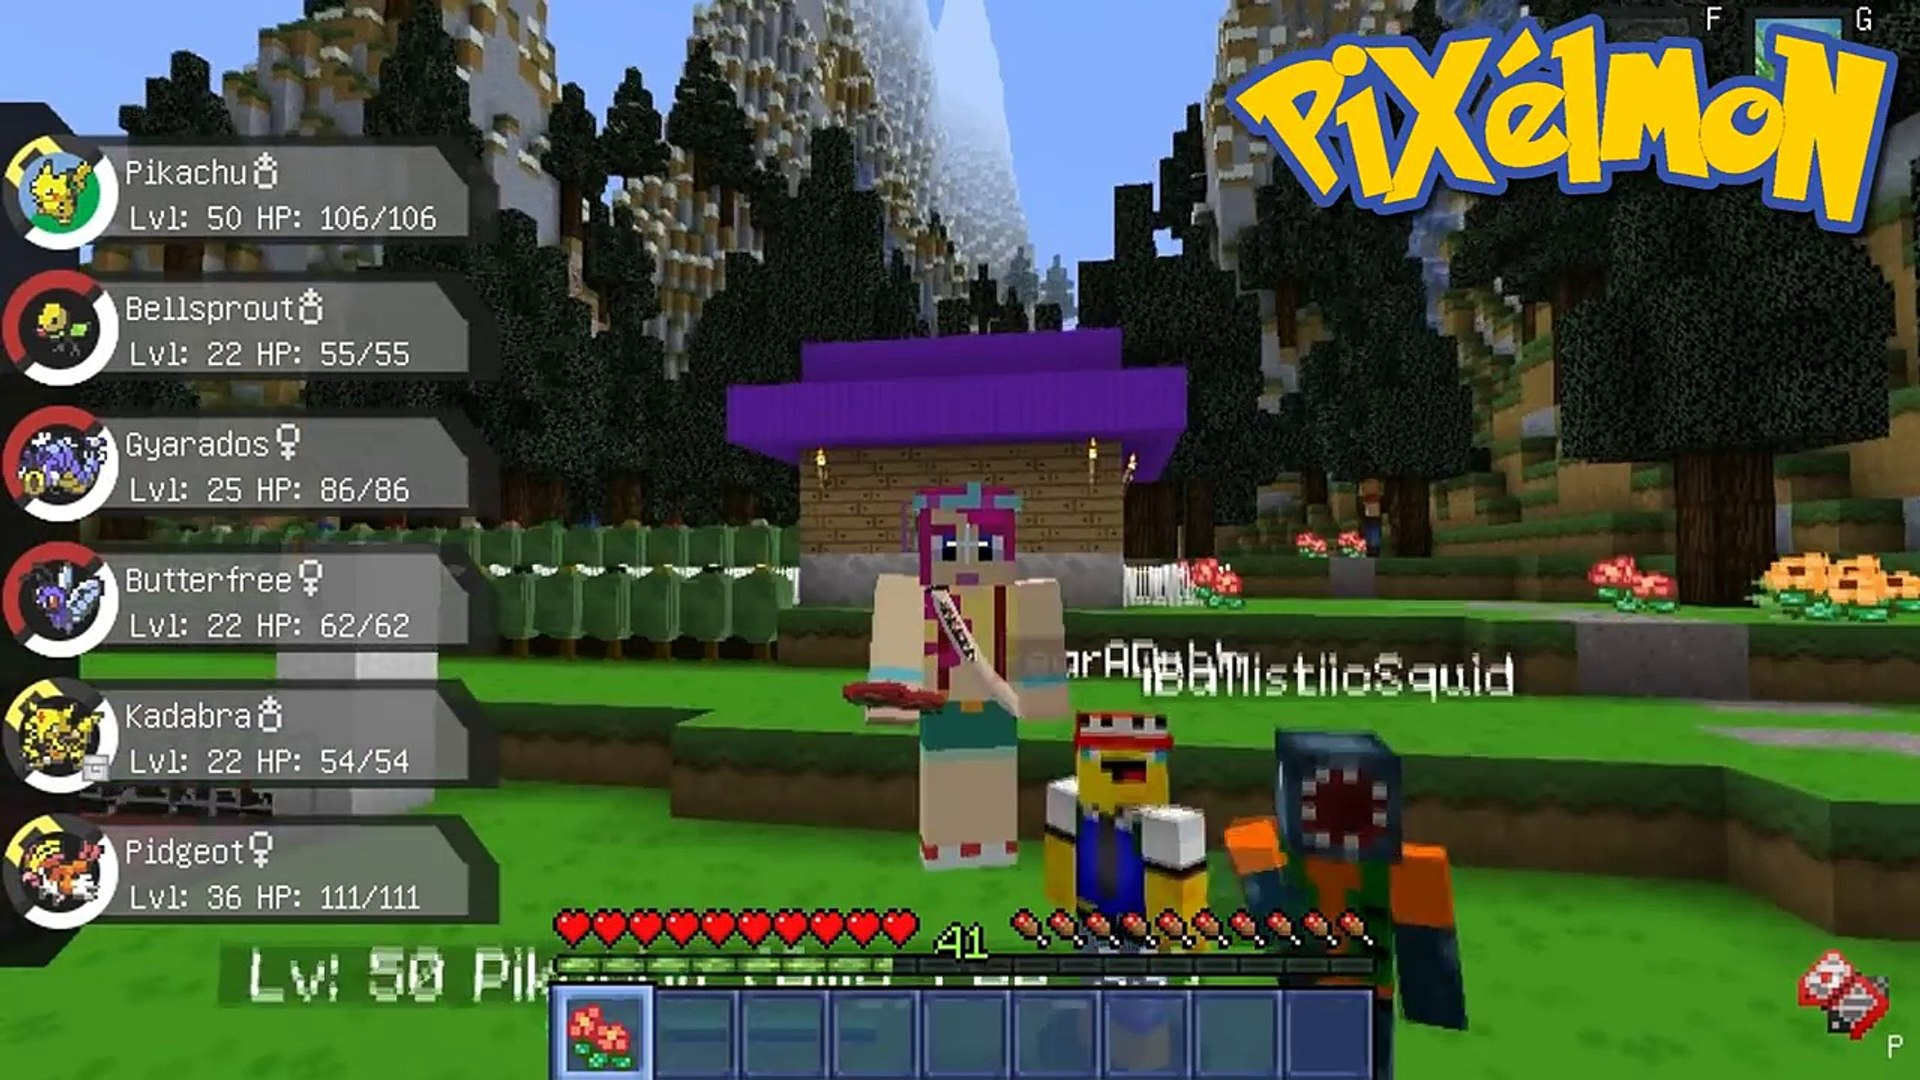 4 Fun Glitches In Minecraft!